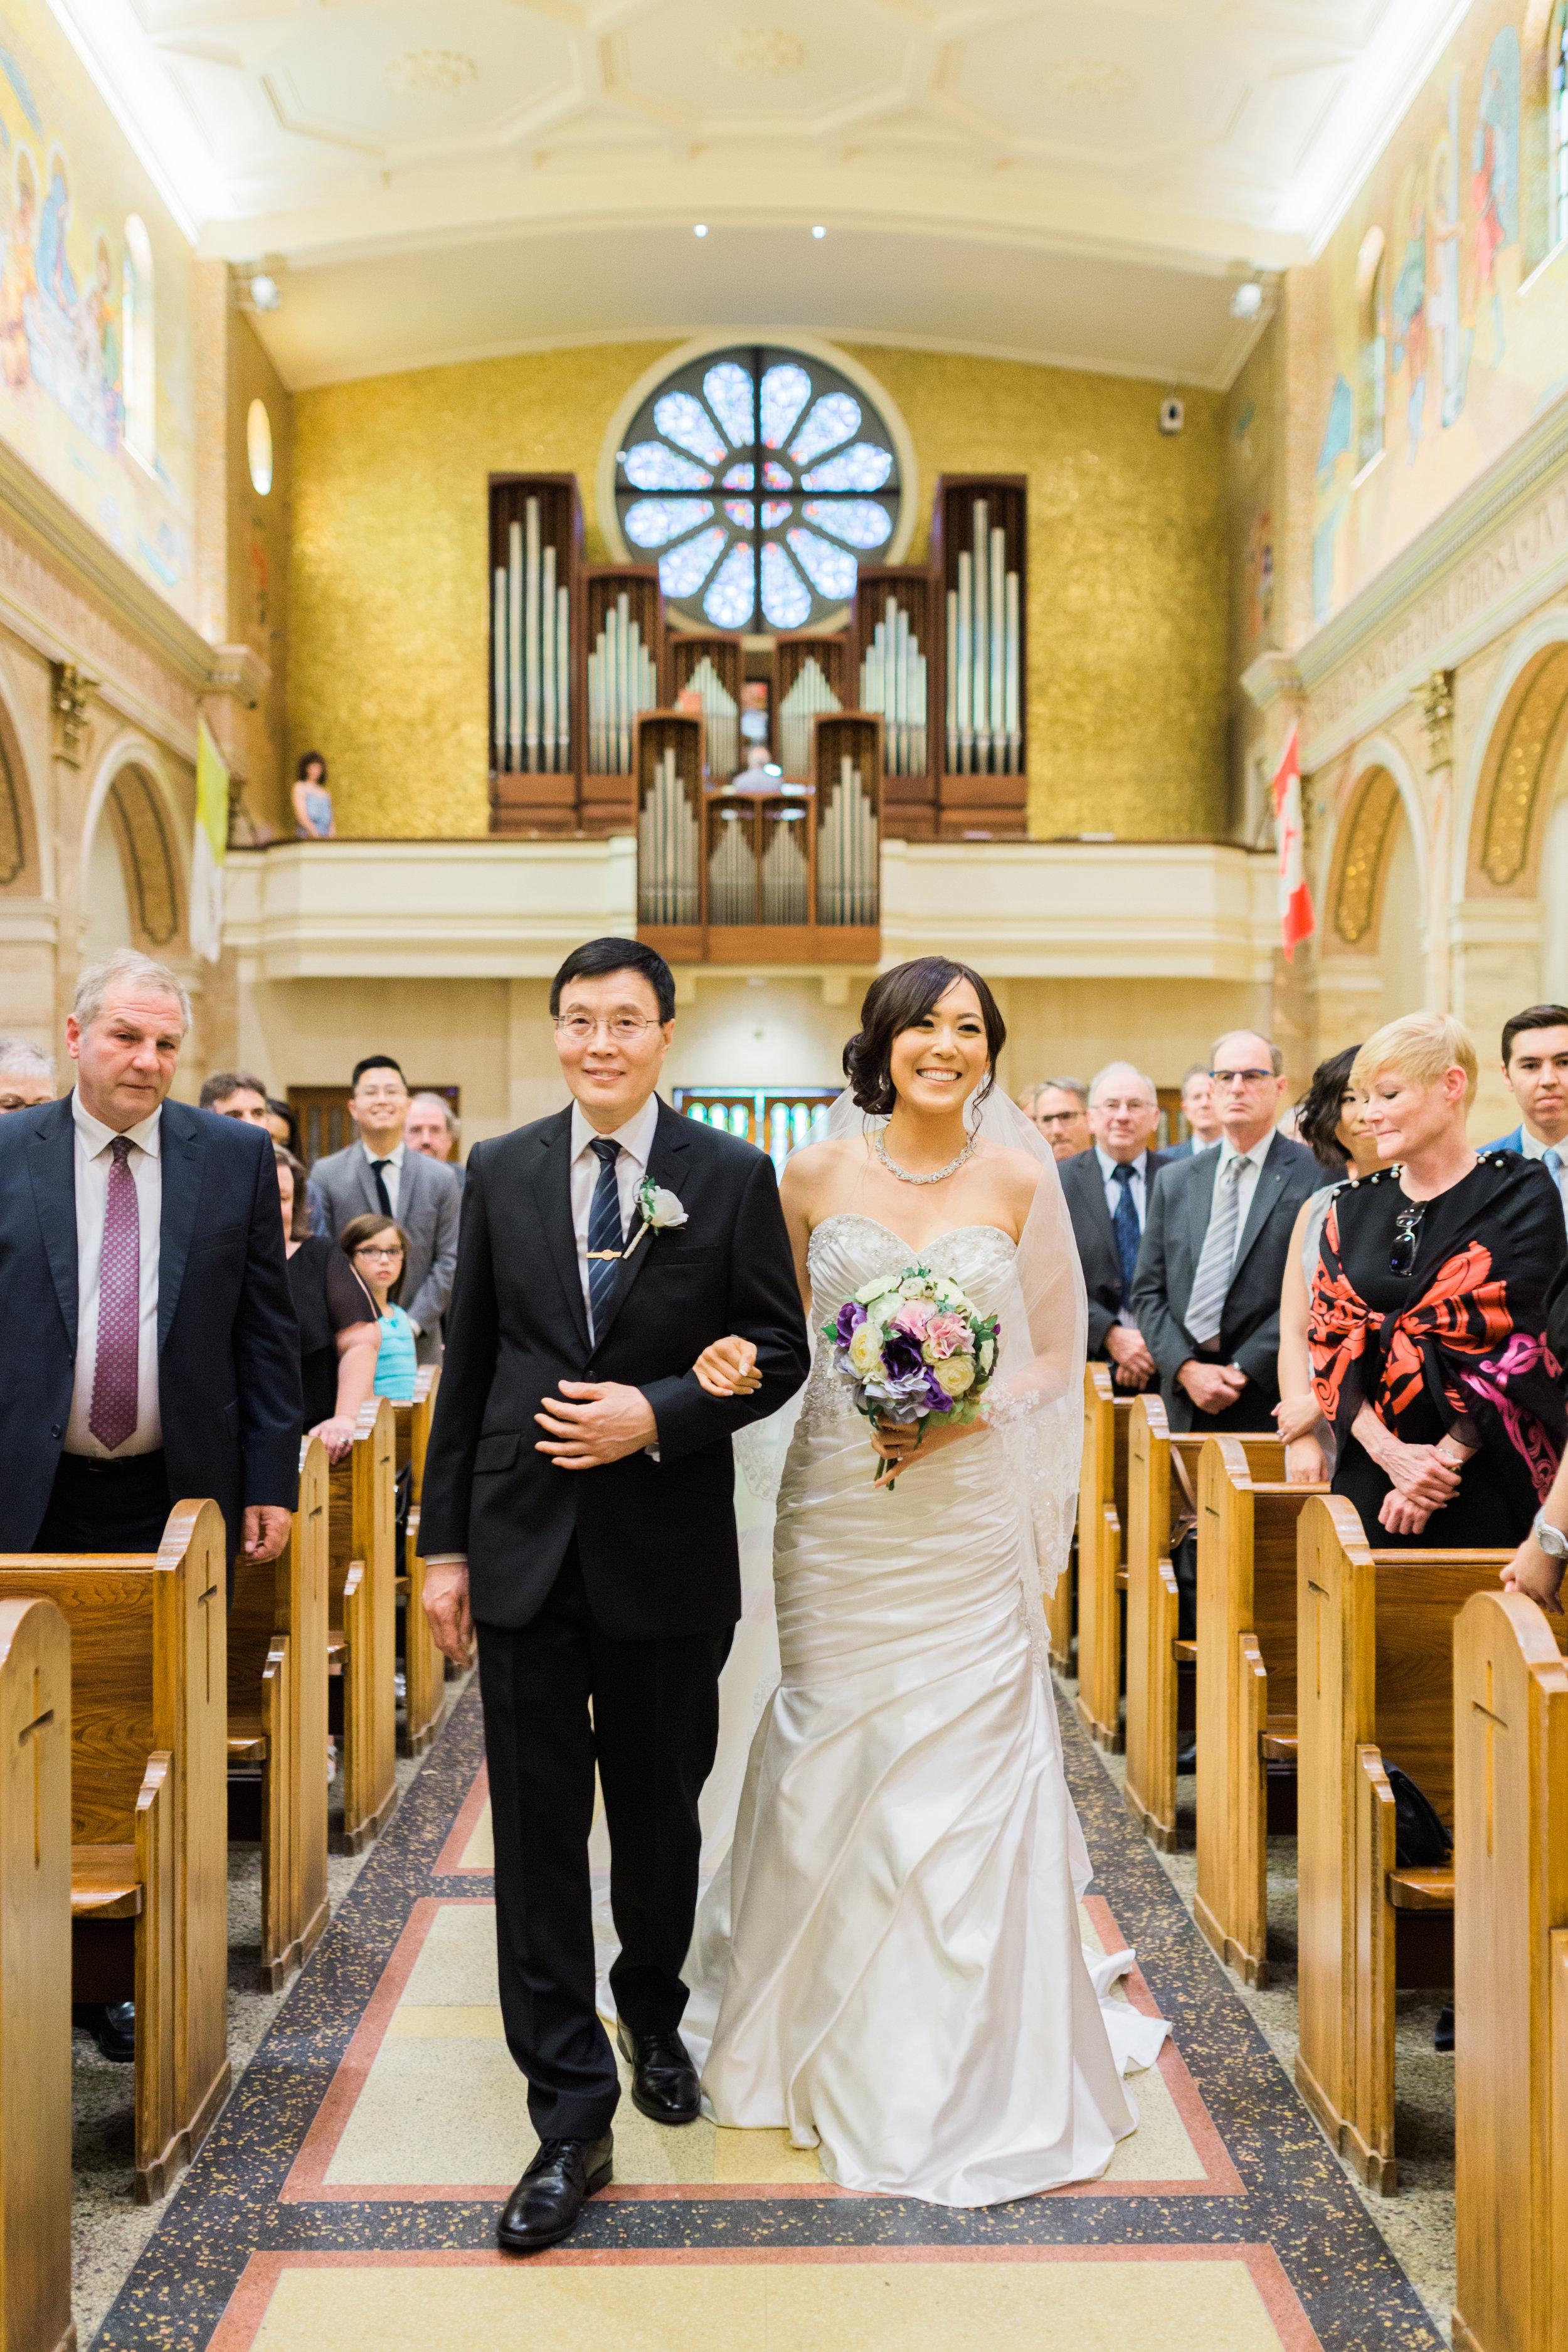 Toronto Fine Art Photographer - Lady of Sorrows Catholic Church Wedding - Ceremony-41.jpg